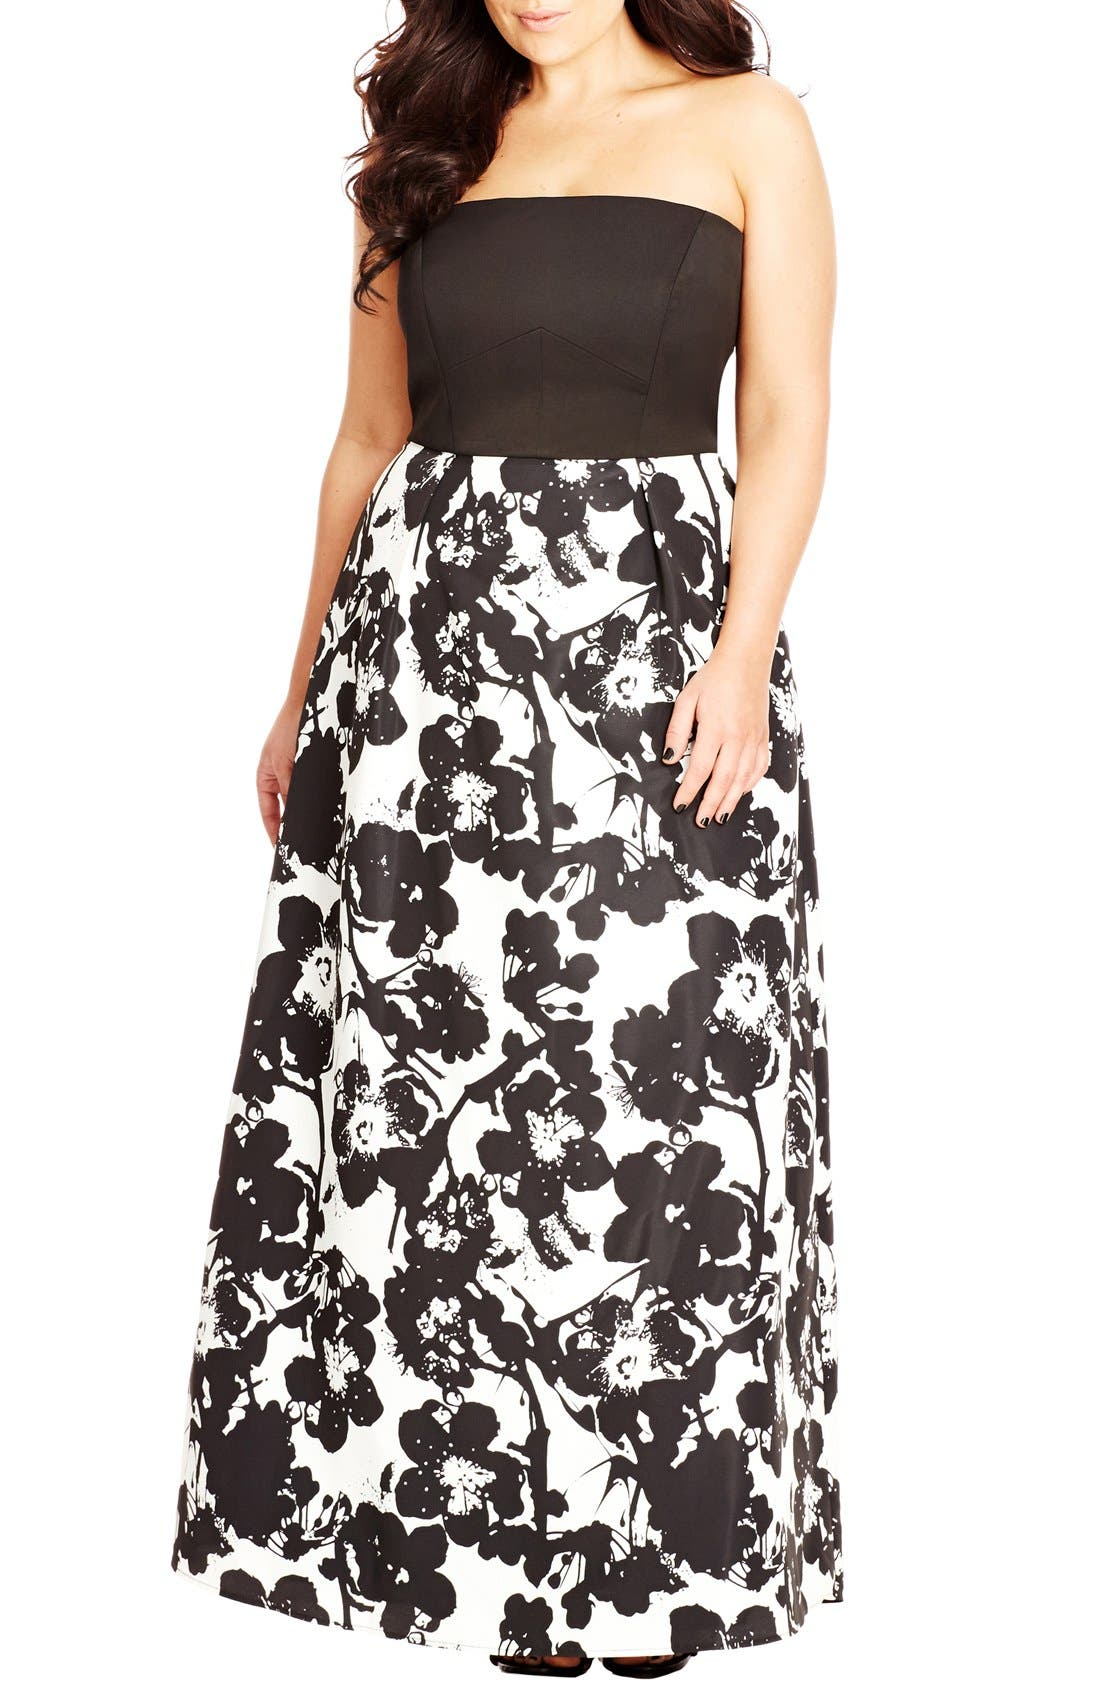 'Painted Poppy' Strapless Maxi Dress,                             Main thumbnail 1, color,                             BLACK